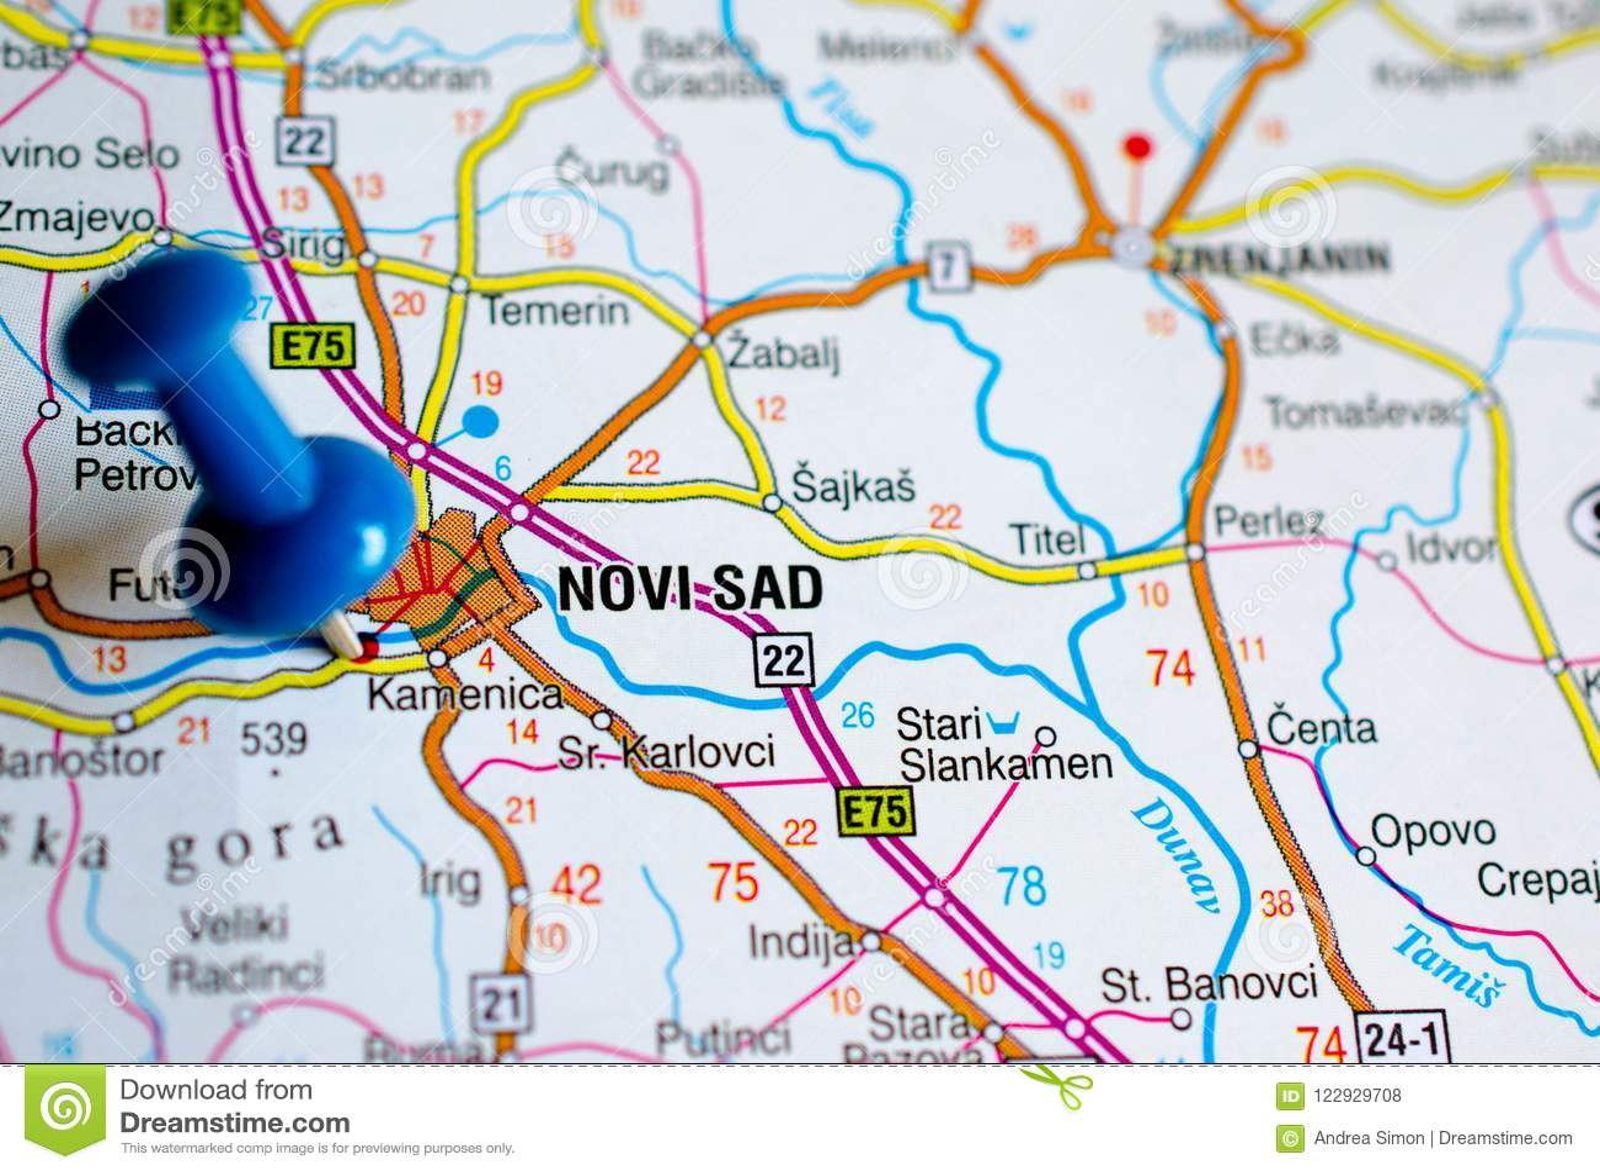 Novi Sad On Map Stock Photo Image Of Cartography Atlas 122929708